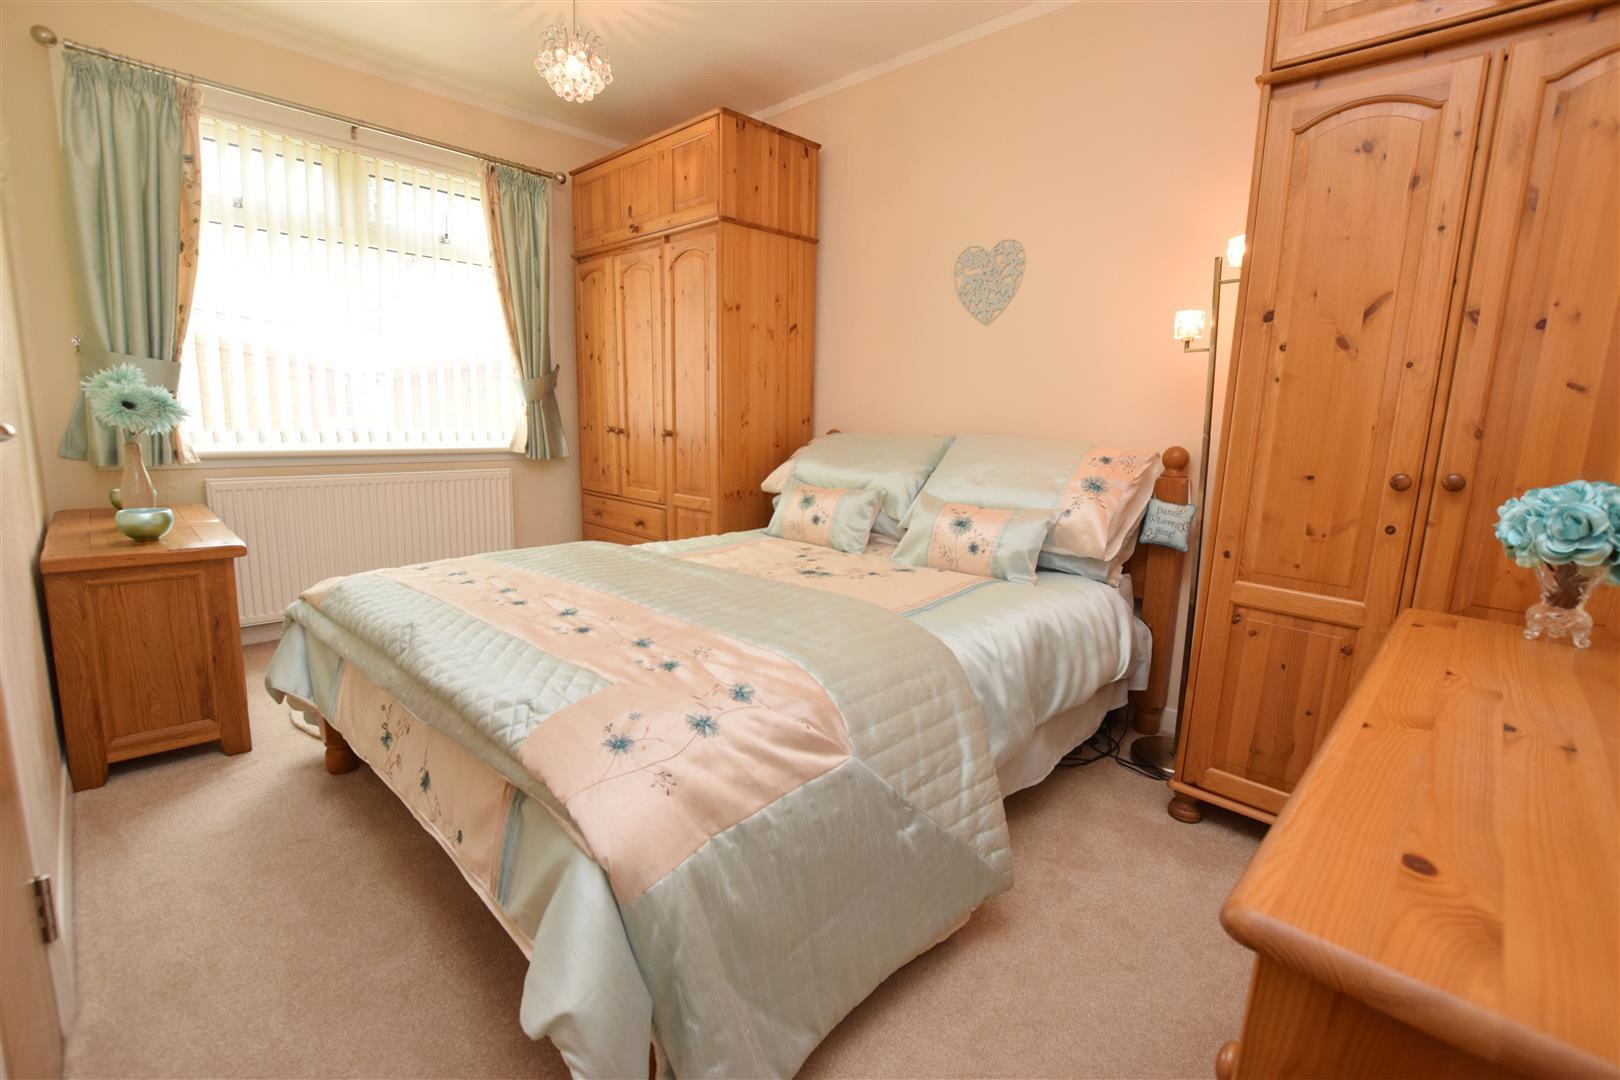 Parkside, 2, St. Margarets Crescent, Auchterarder, Perthshire, PH3 1LT, UK